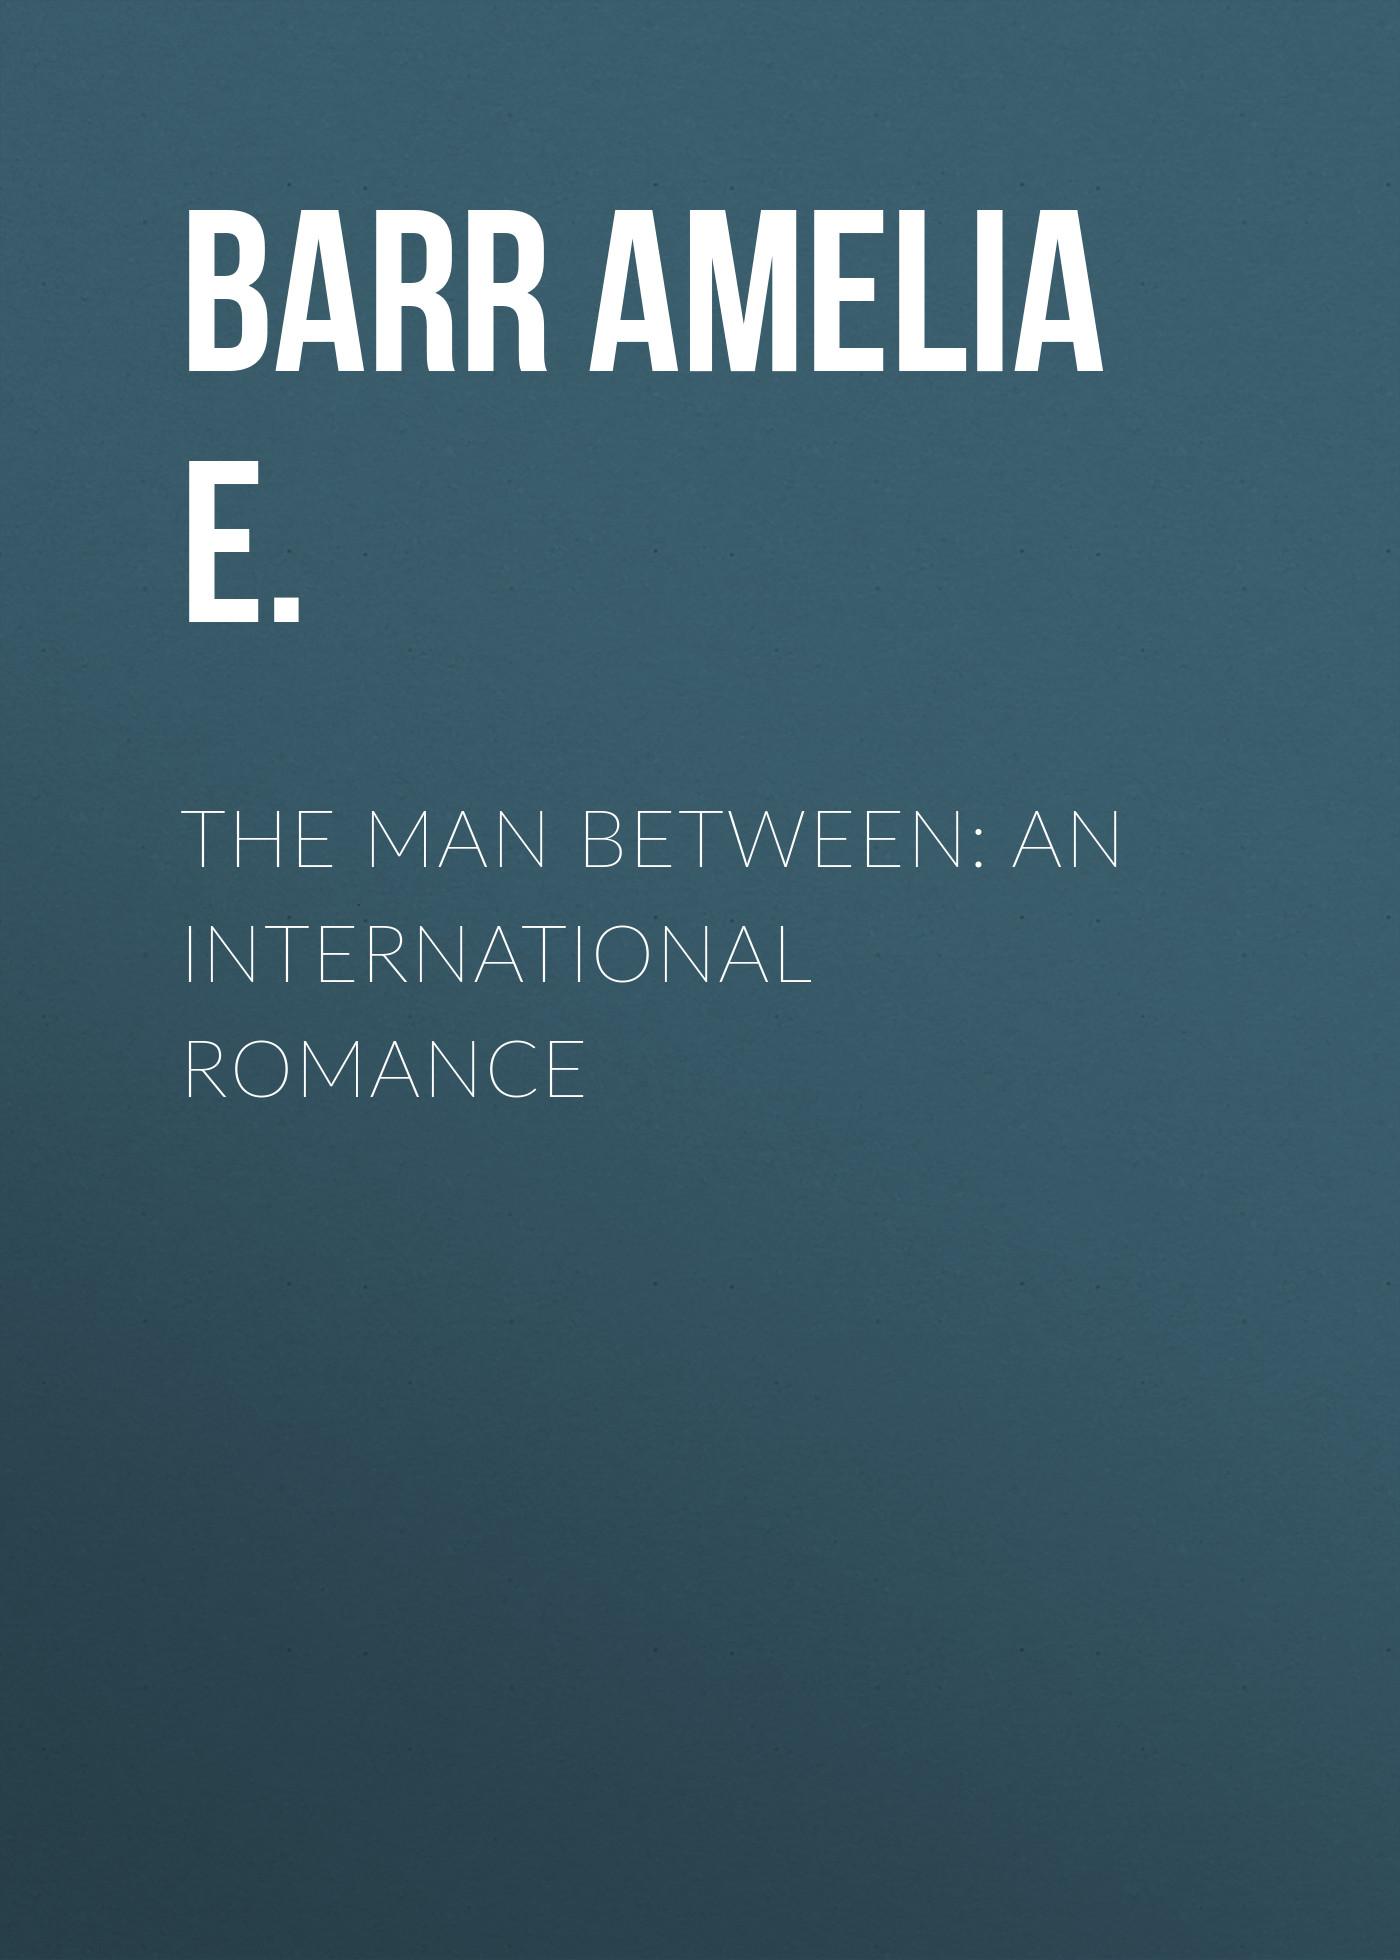 Barr Amelia E. The Man Between: An International Romance цена 2017